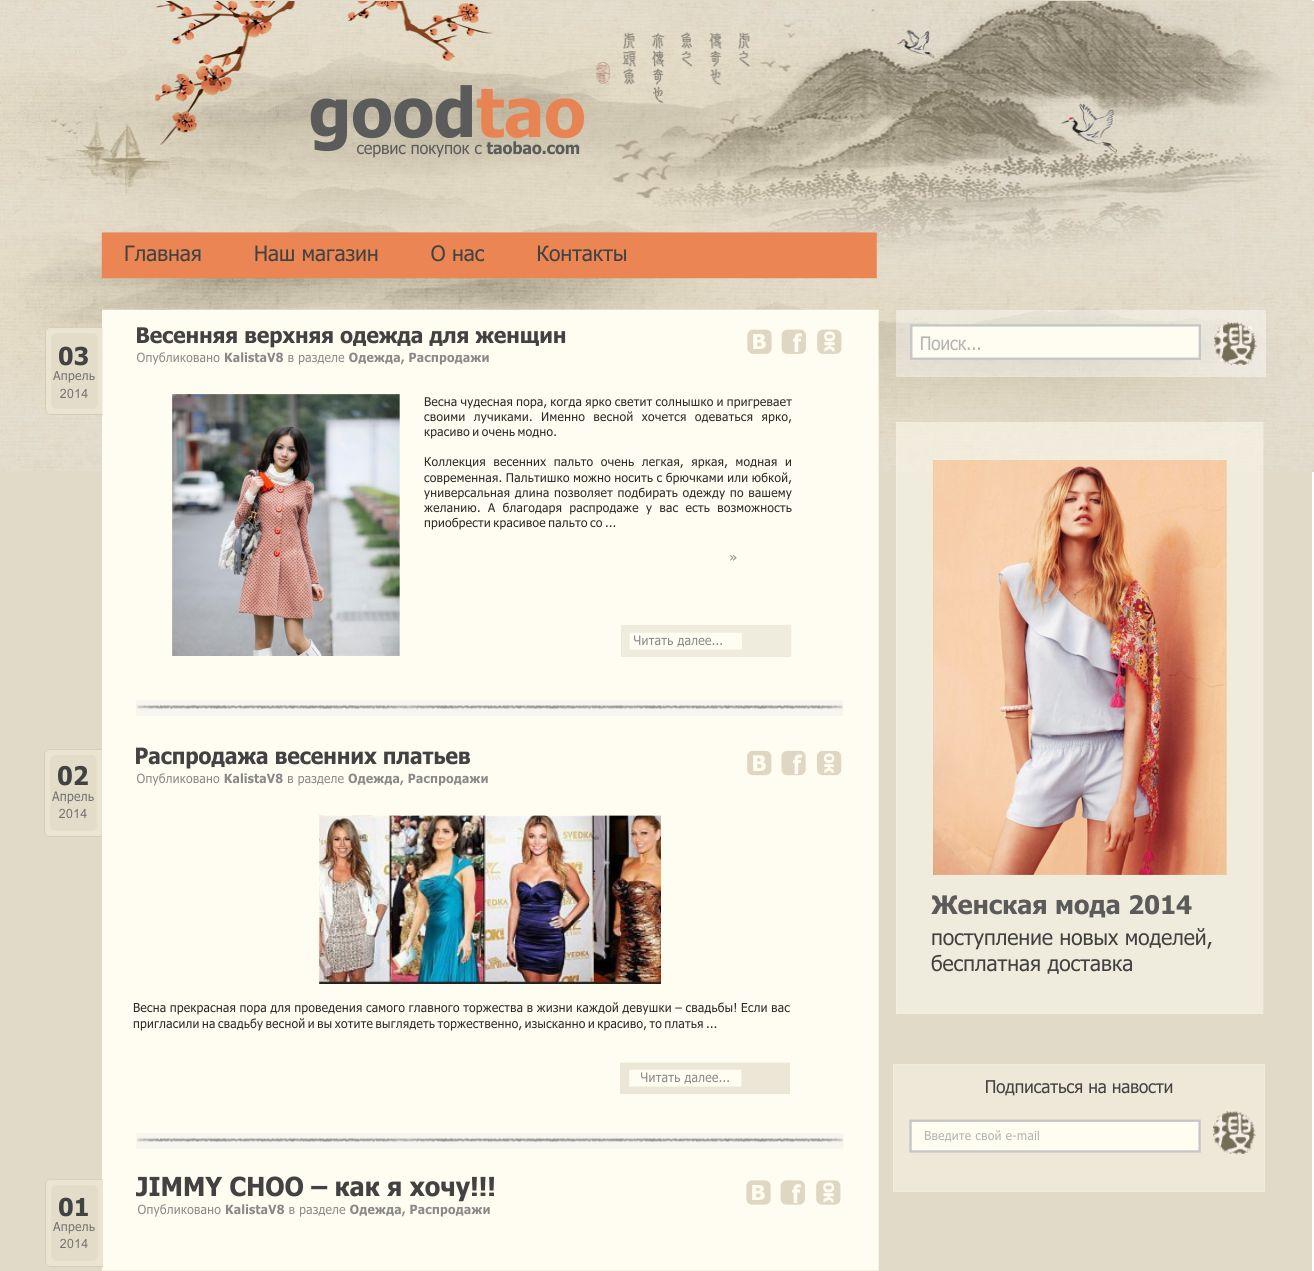 Дизайн для блога - дизайнер KovalevaV8